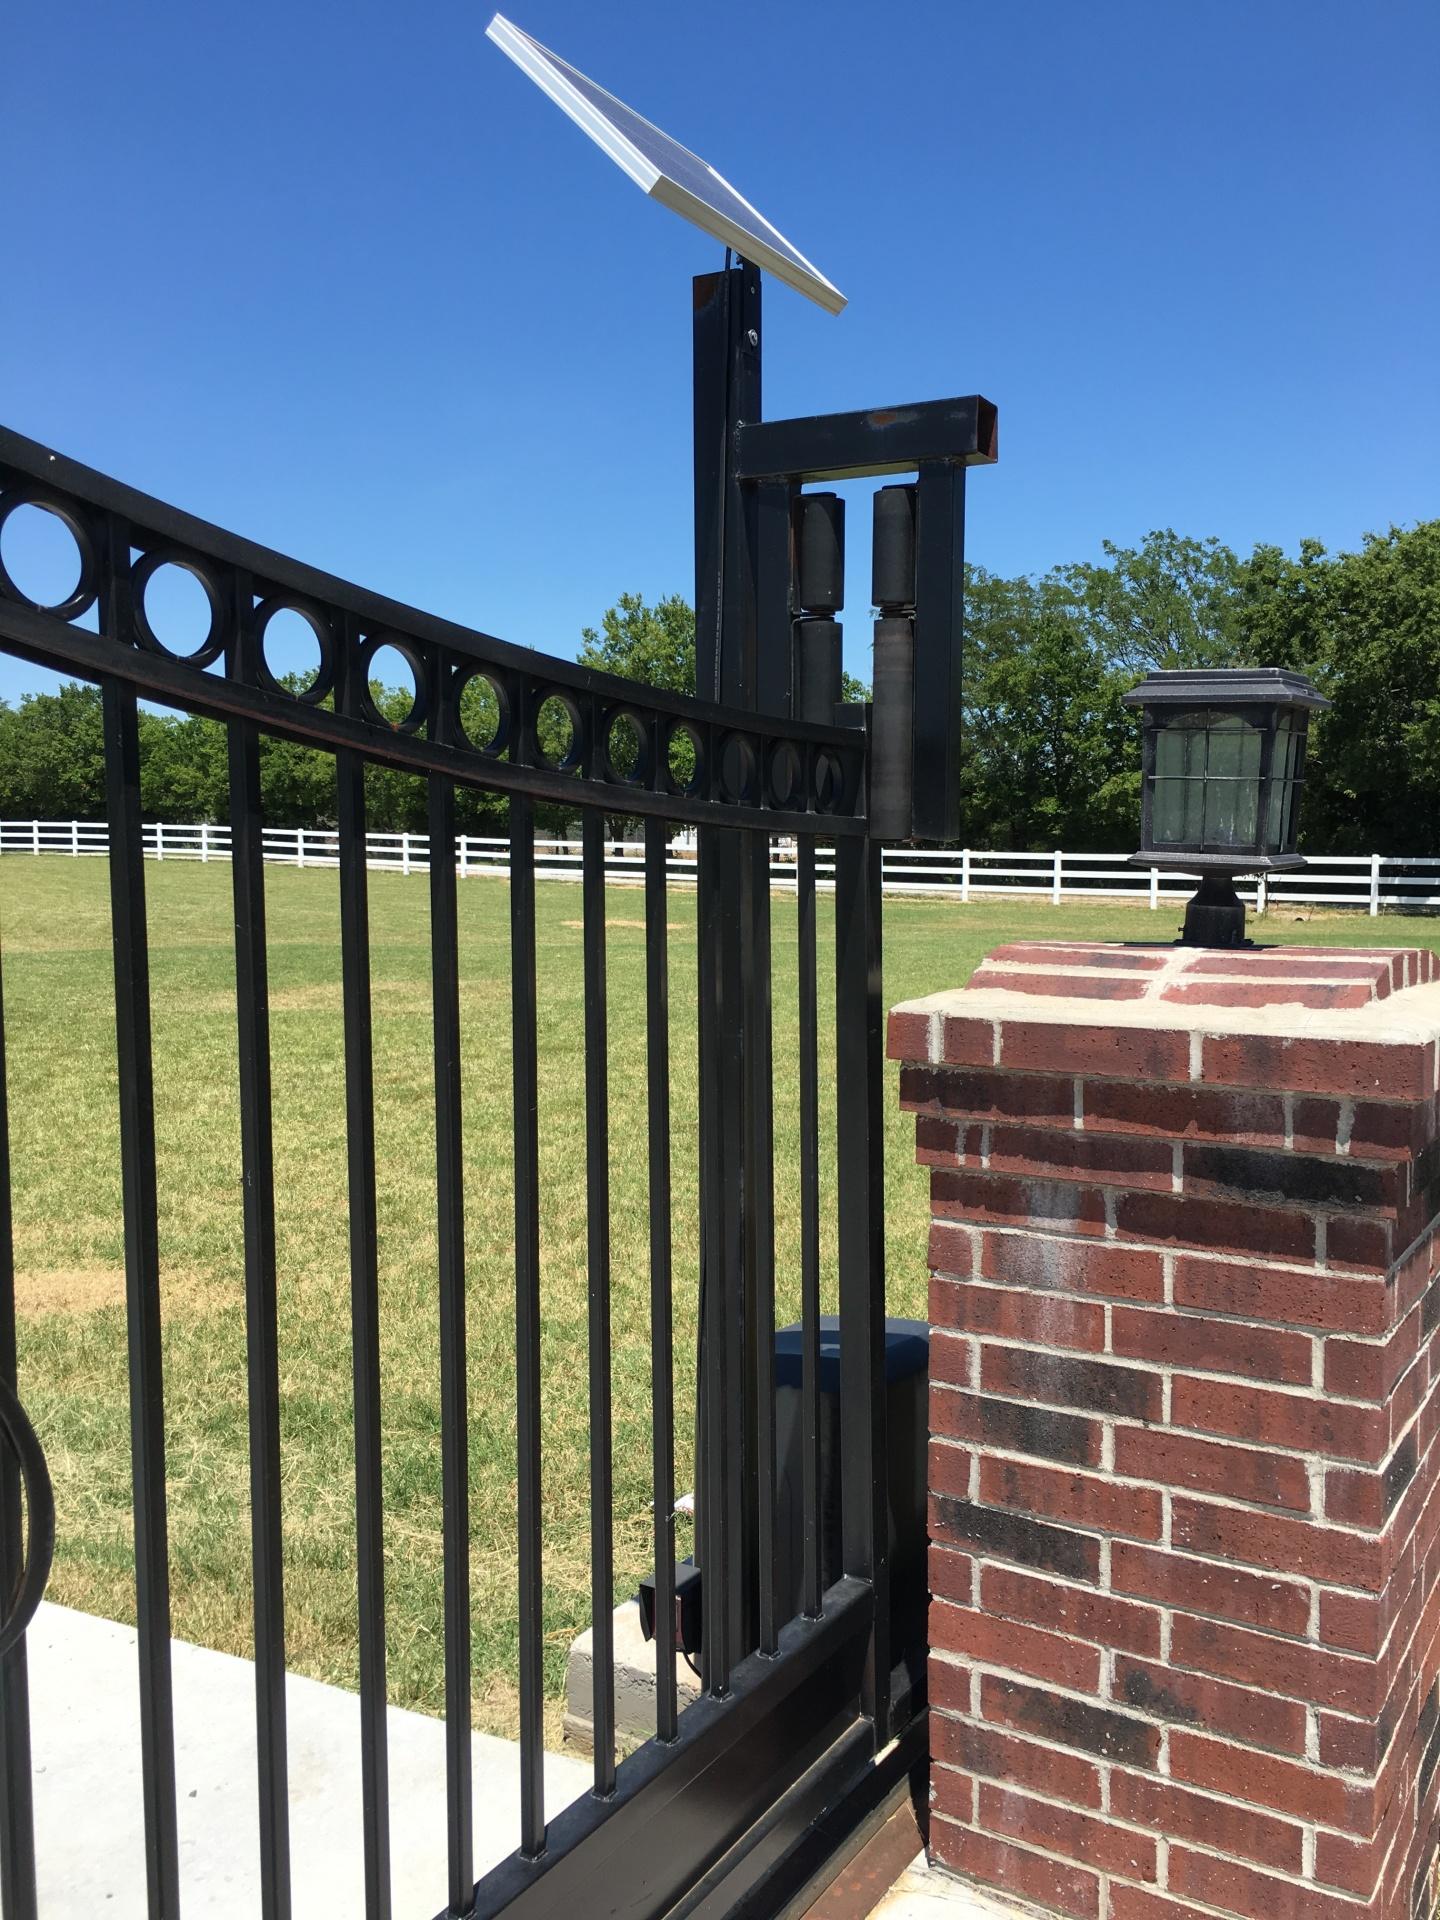 Edmond fence and gate company - solar openers - gate access - security gates - custom iron gates - driveway gate opener - local oklahoma company